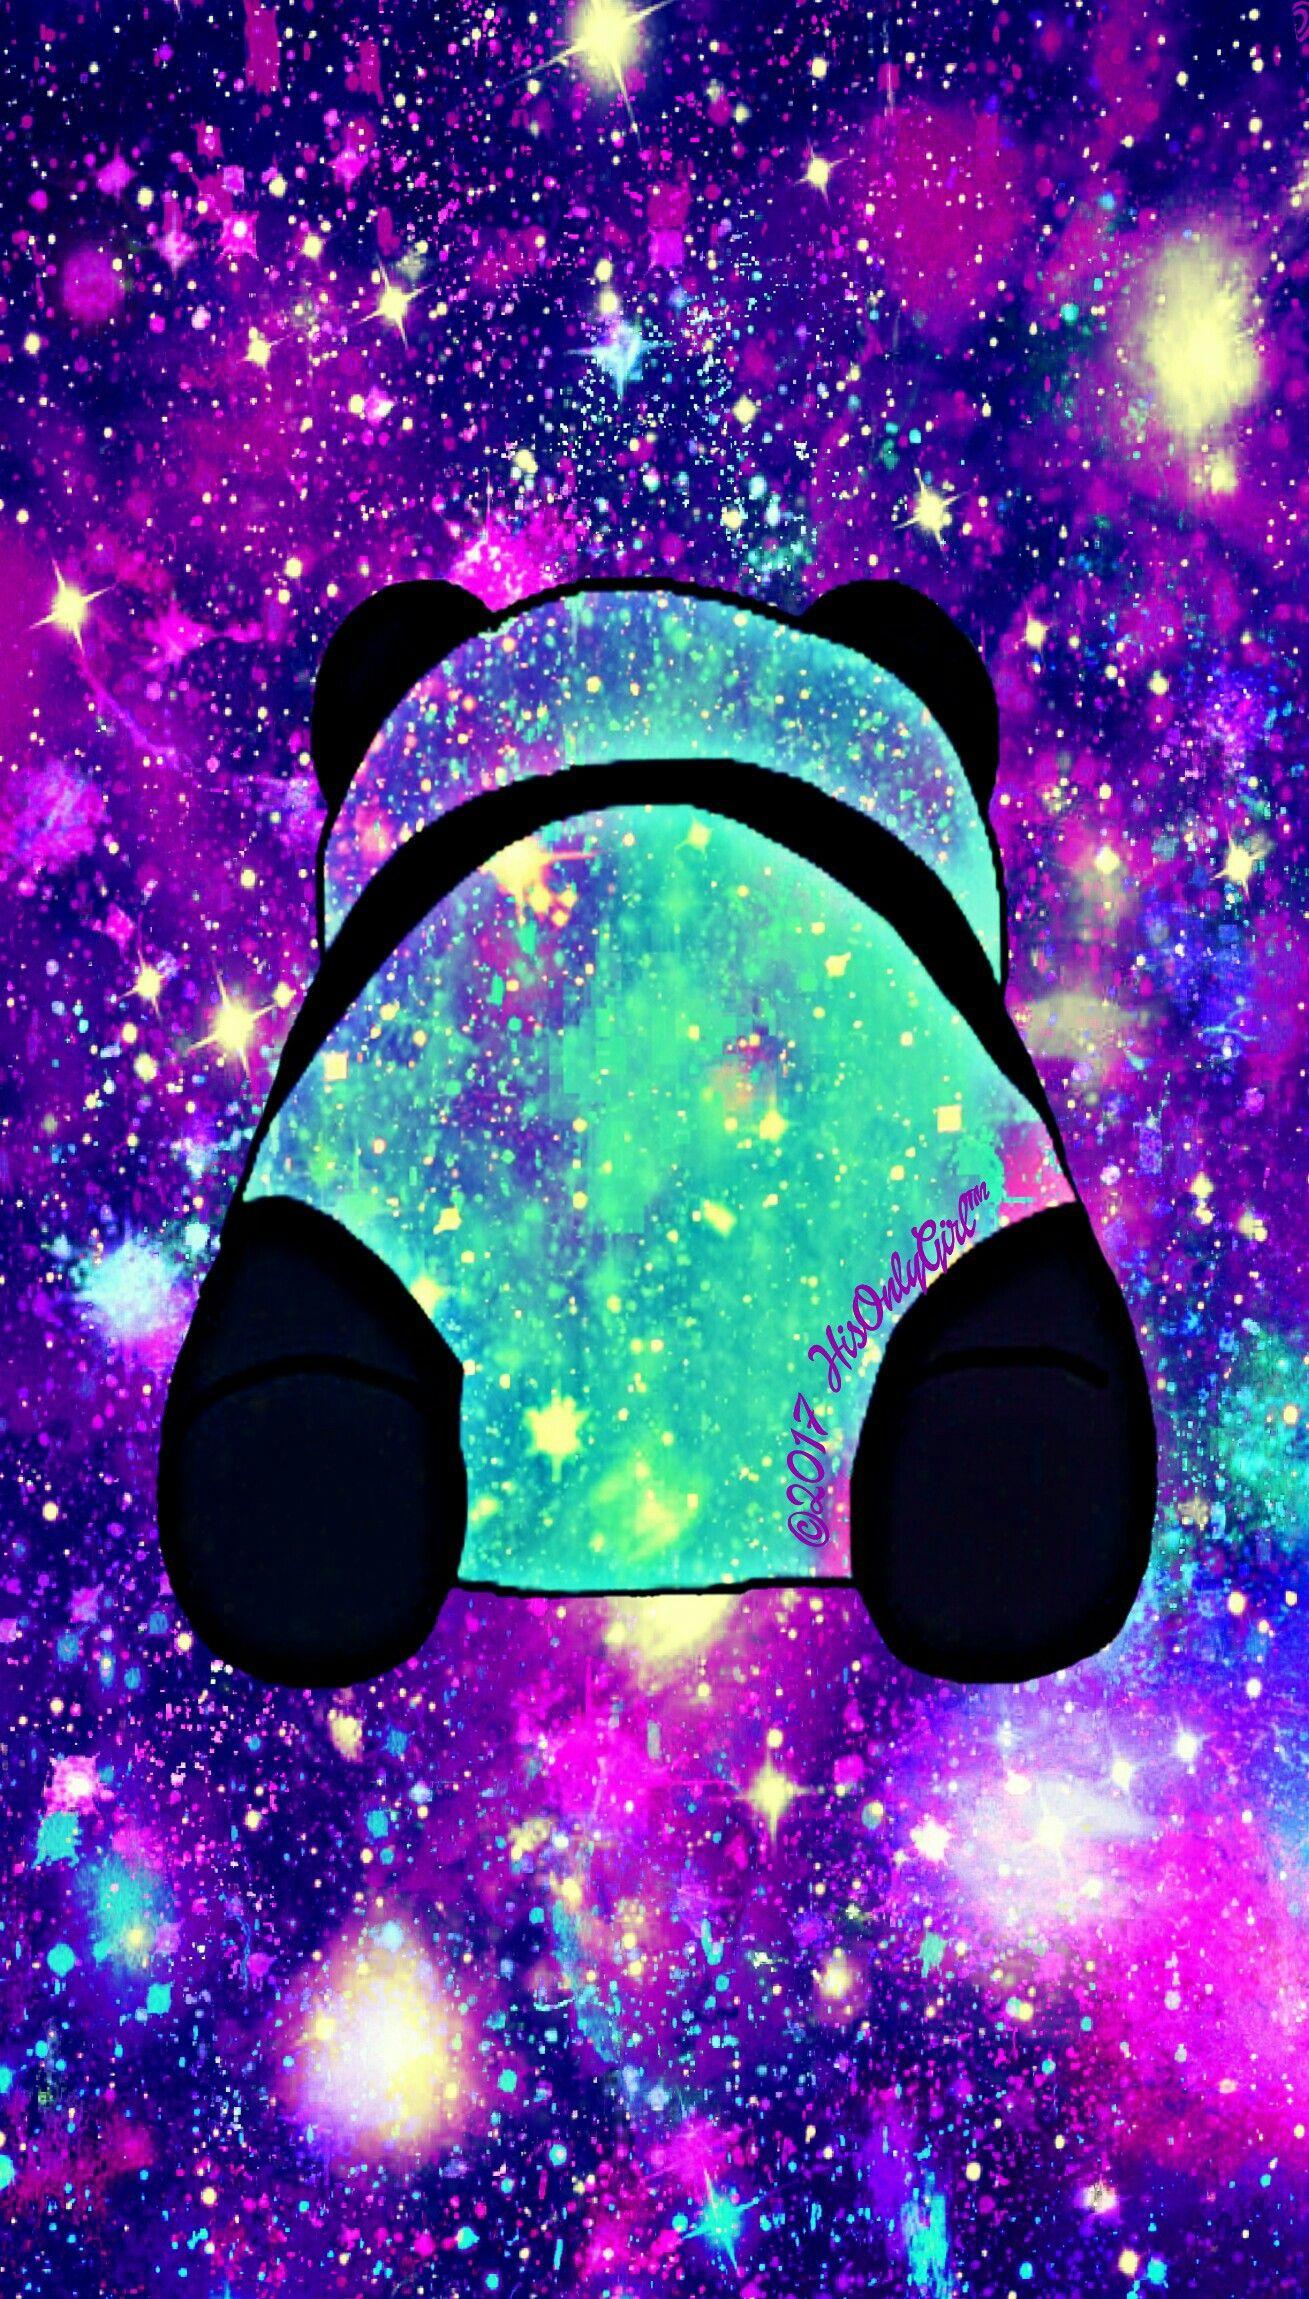 Purple Panda Cheeks Galaxy Wallpaper I Created For The App Cocoppa Cute Panda Wallpaper Panda Wallpapers Cute Galaxy Wallpaper